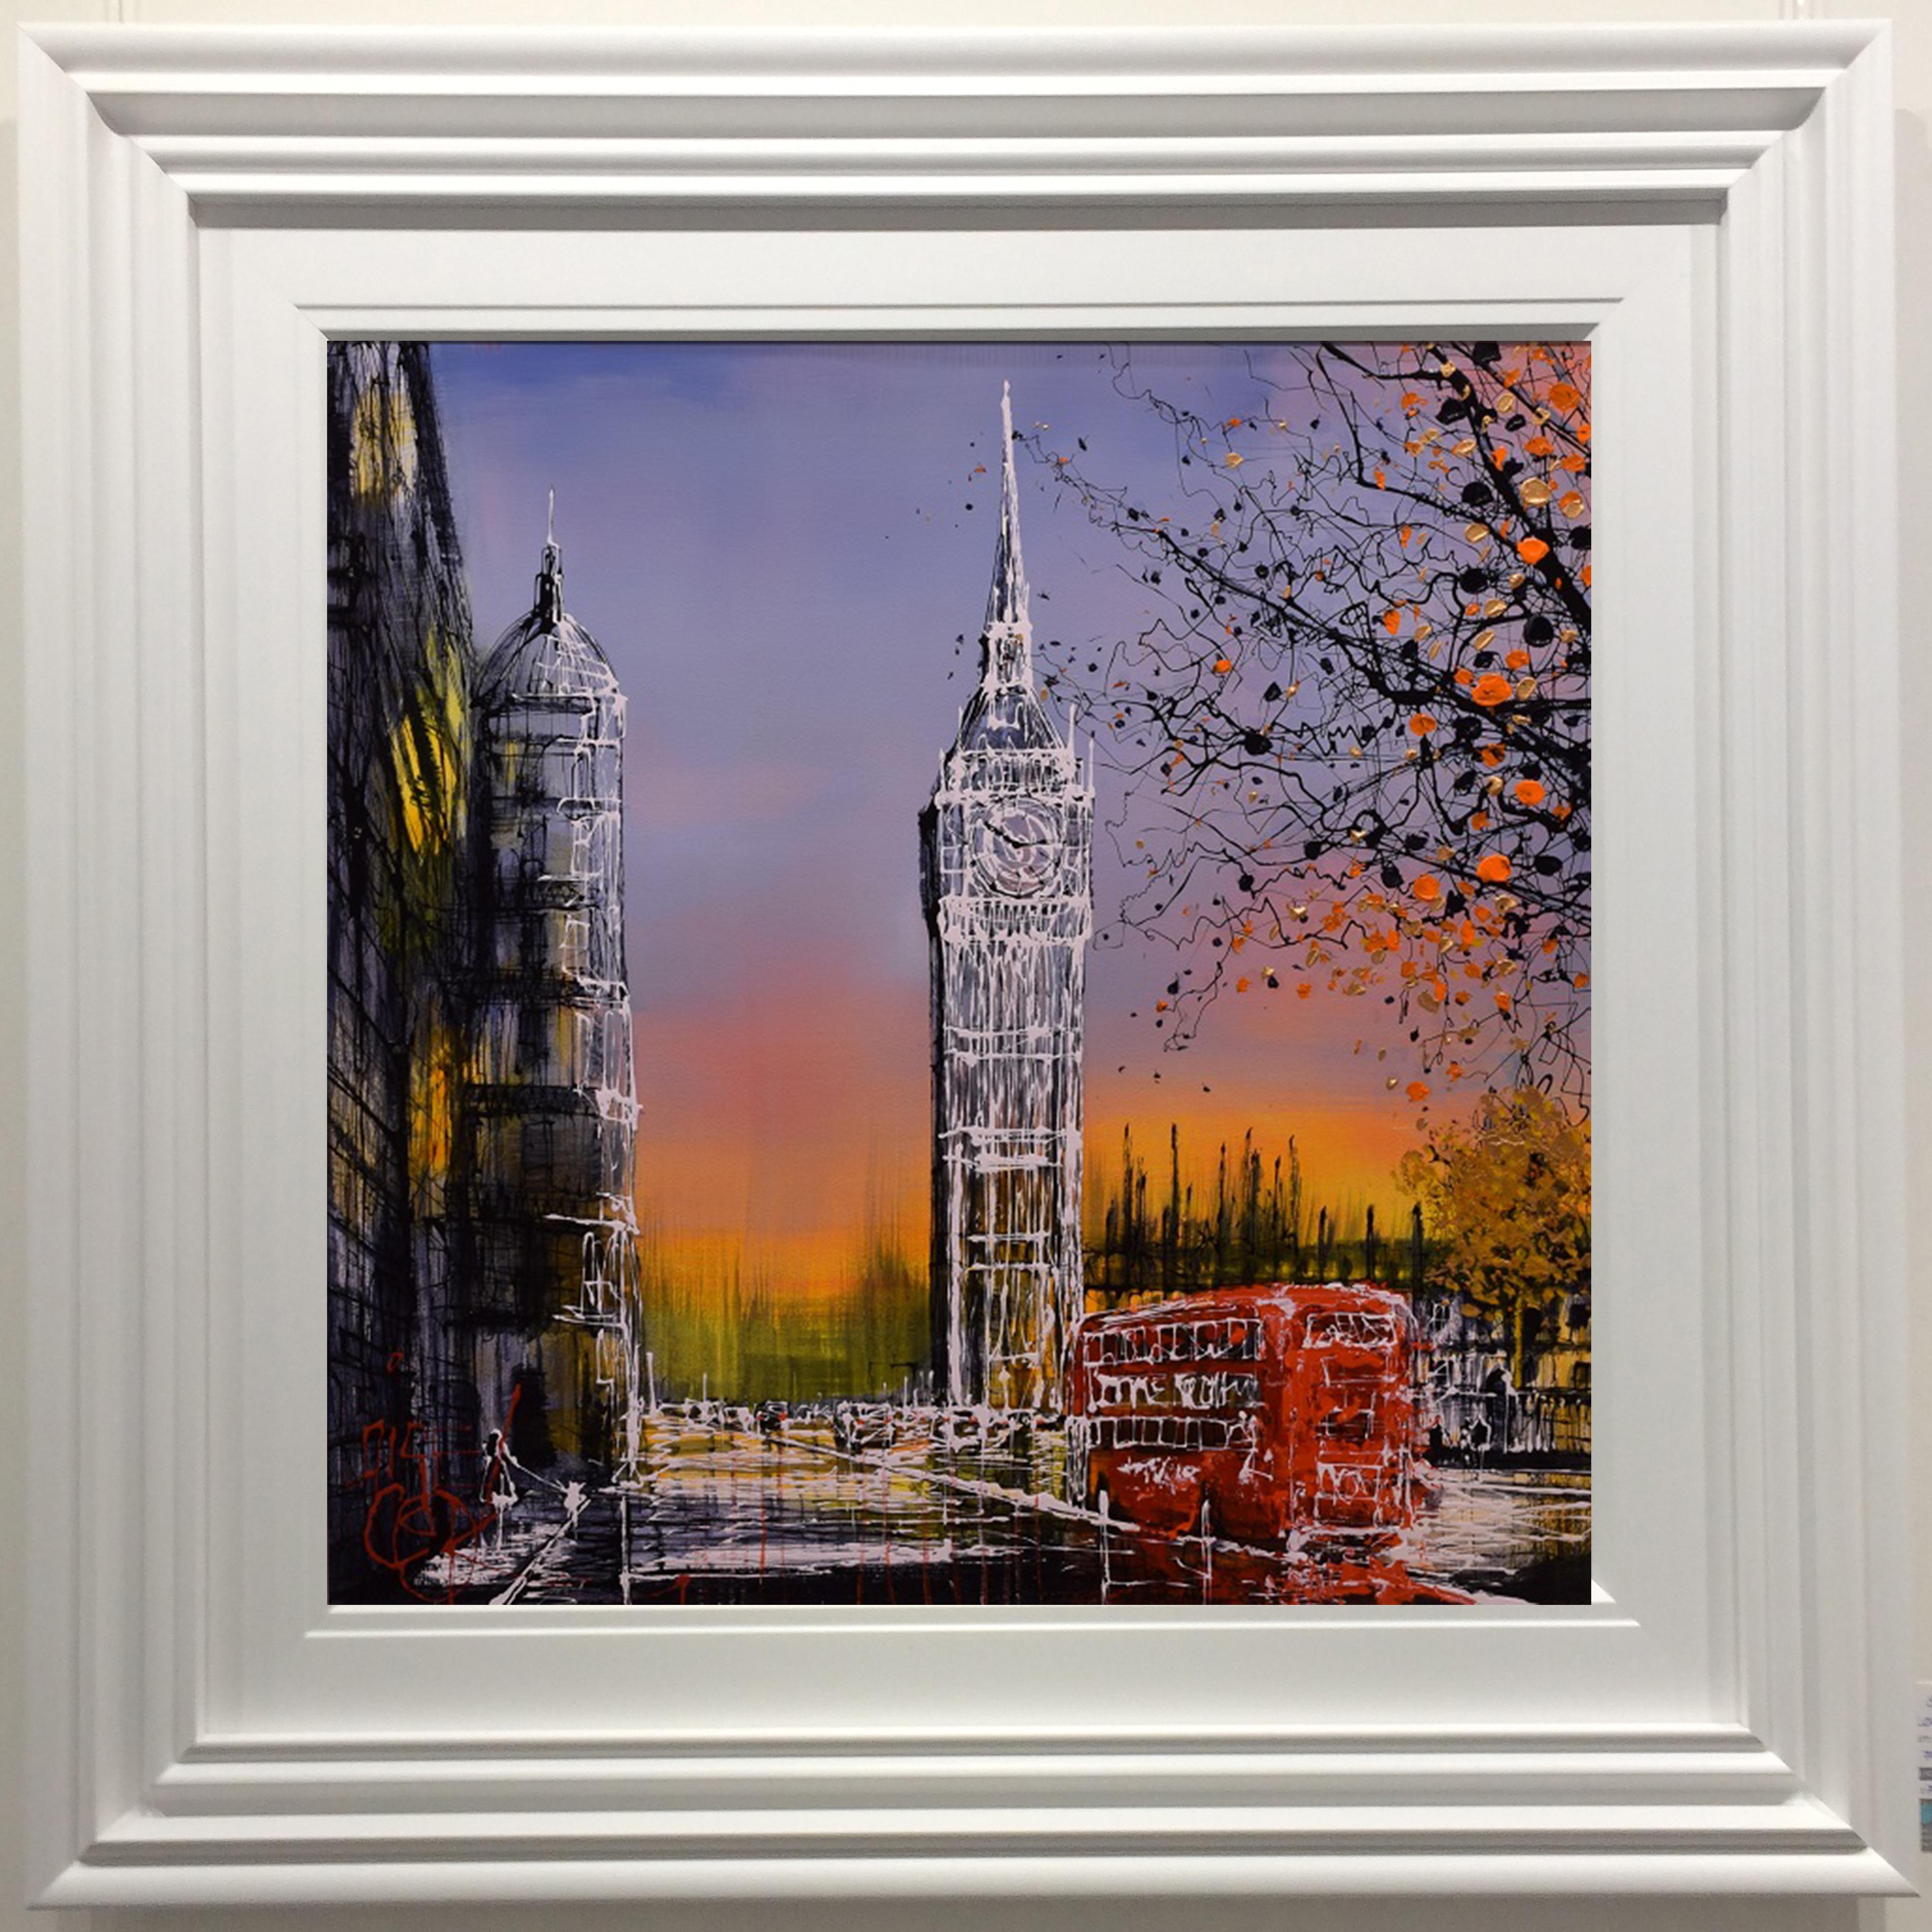 Iconic London by Nigel Cooke